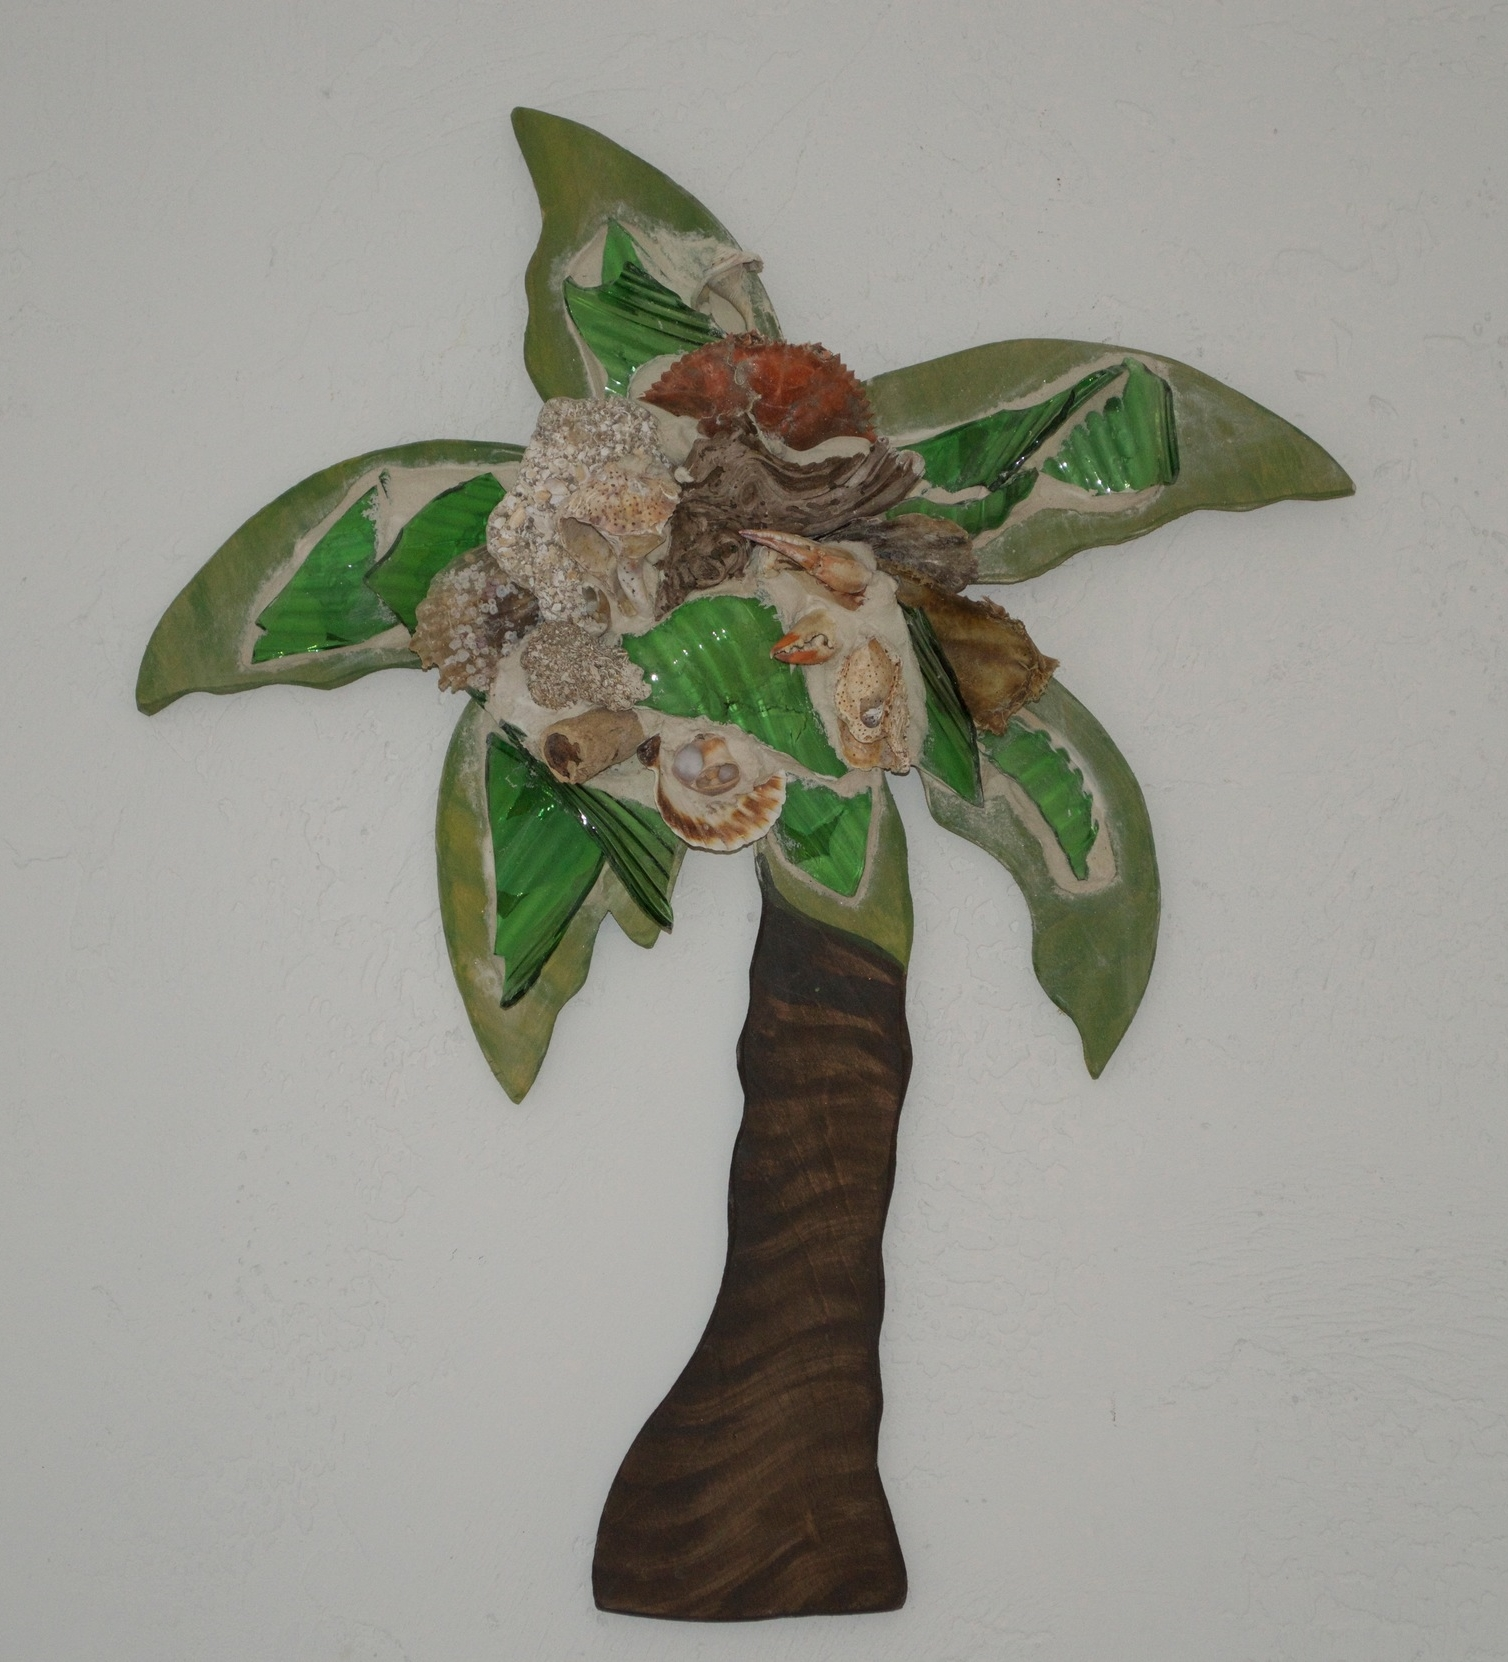 "Beach Art - Palm Tree - wood, glass, beach objects - small 11"" x 12"", $58 - large 21"" x 25"", $84"